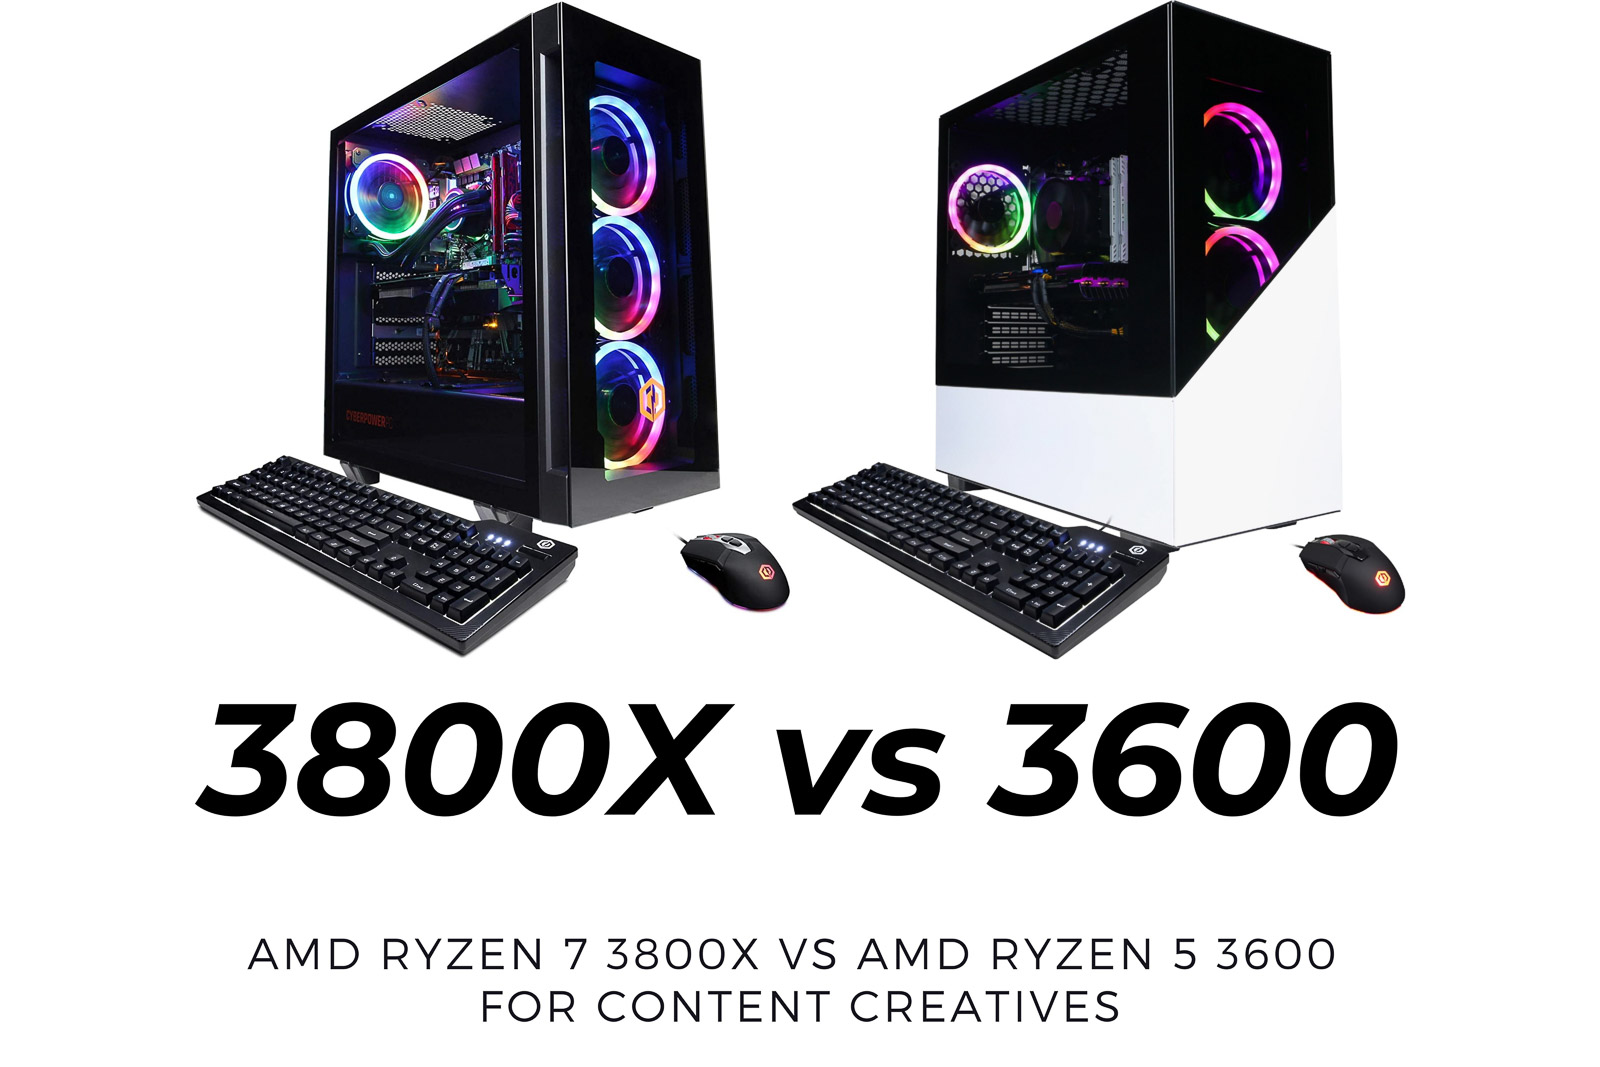 AMD Ryzen 7 3800X vs AMD Ryzen 5 3600 for Content Creatives